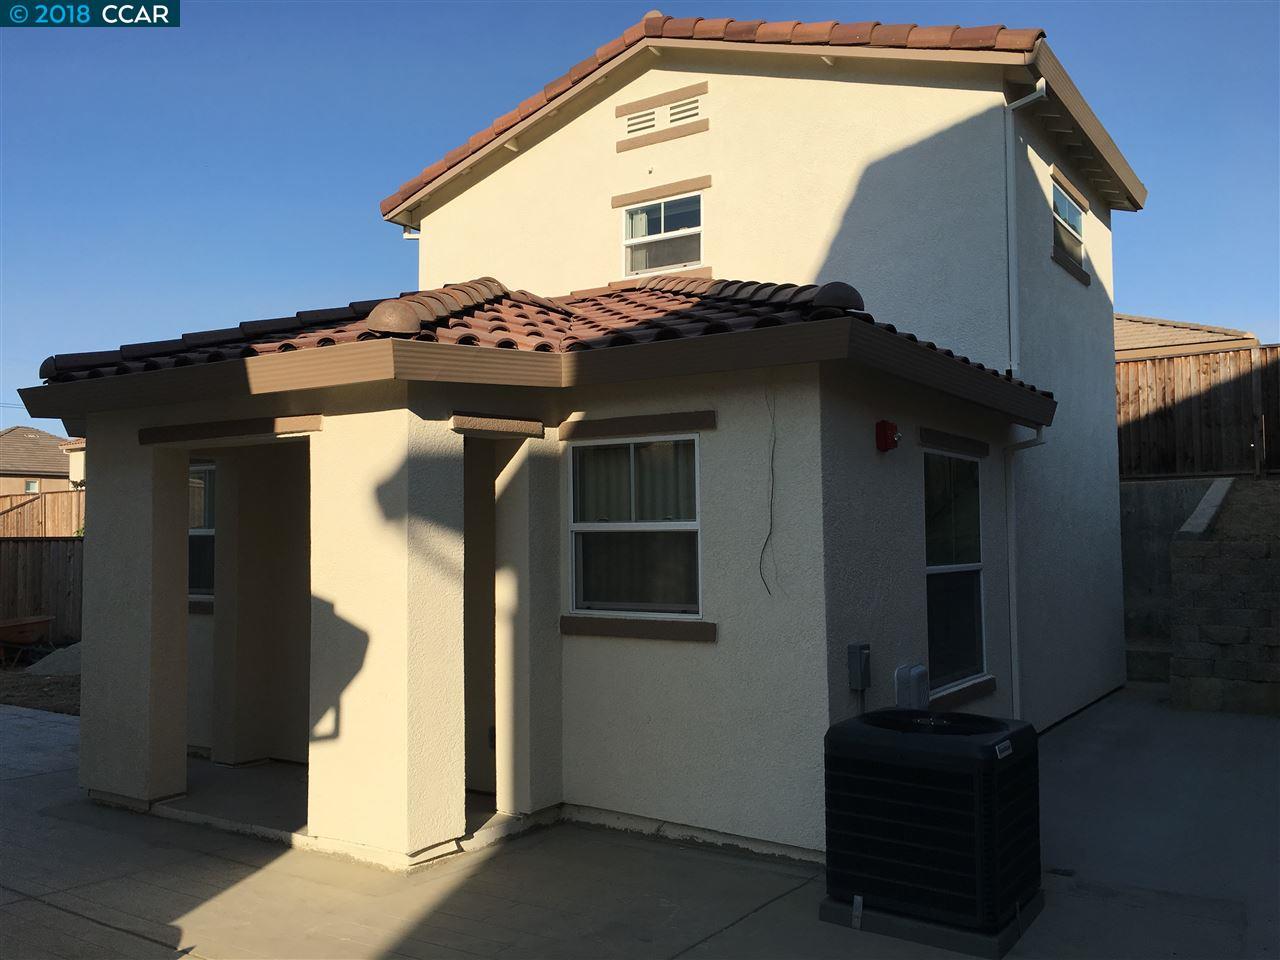 獨棟家庭住宅 為 出租 在 2655 Tomales Bay 2655 Tomales Bay Bay Point, 加利福尼亞州 93454 美國